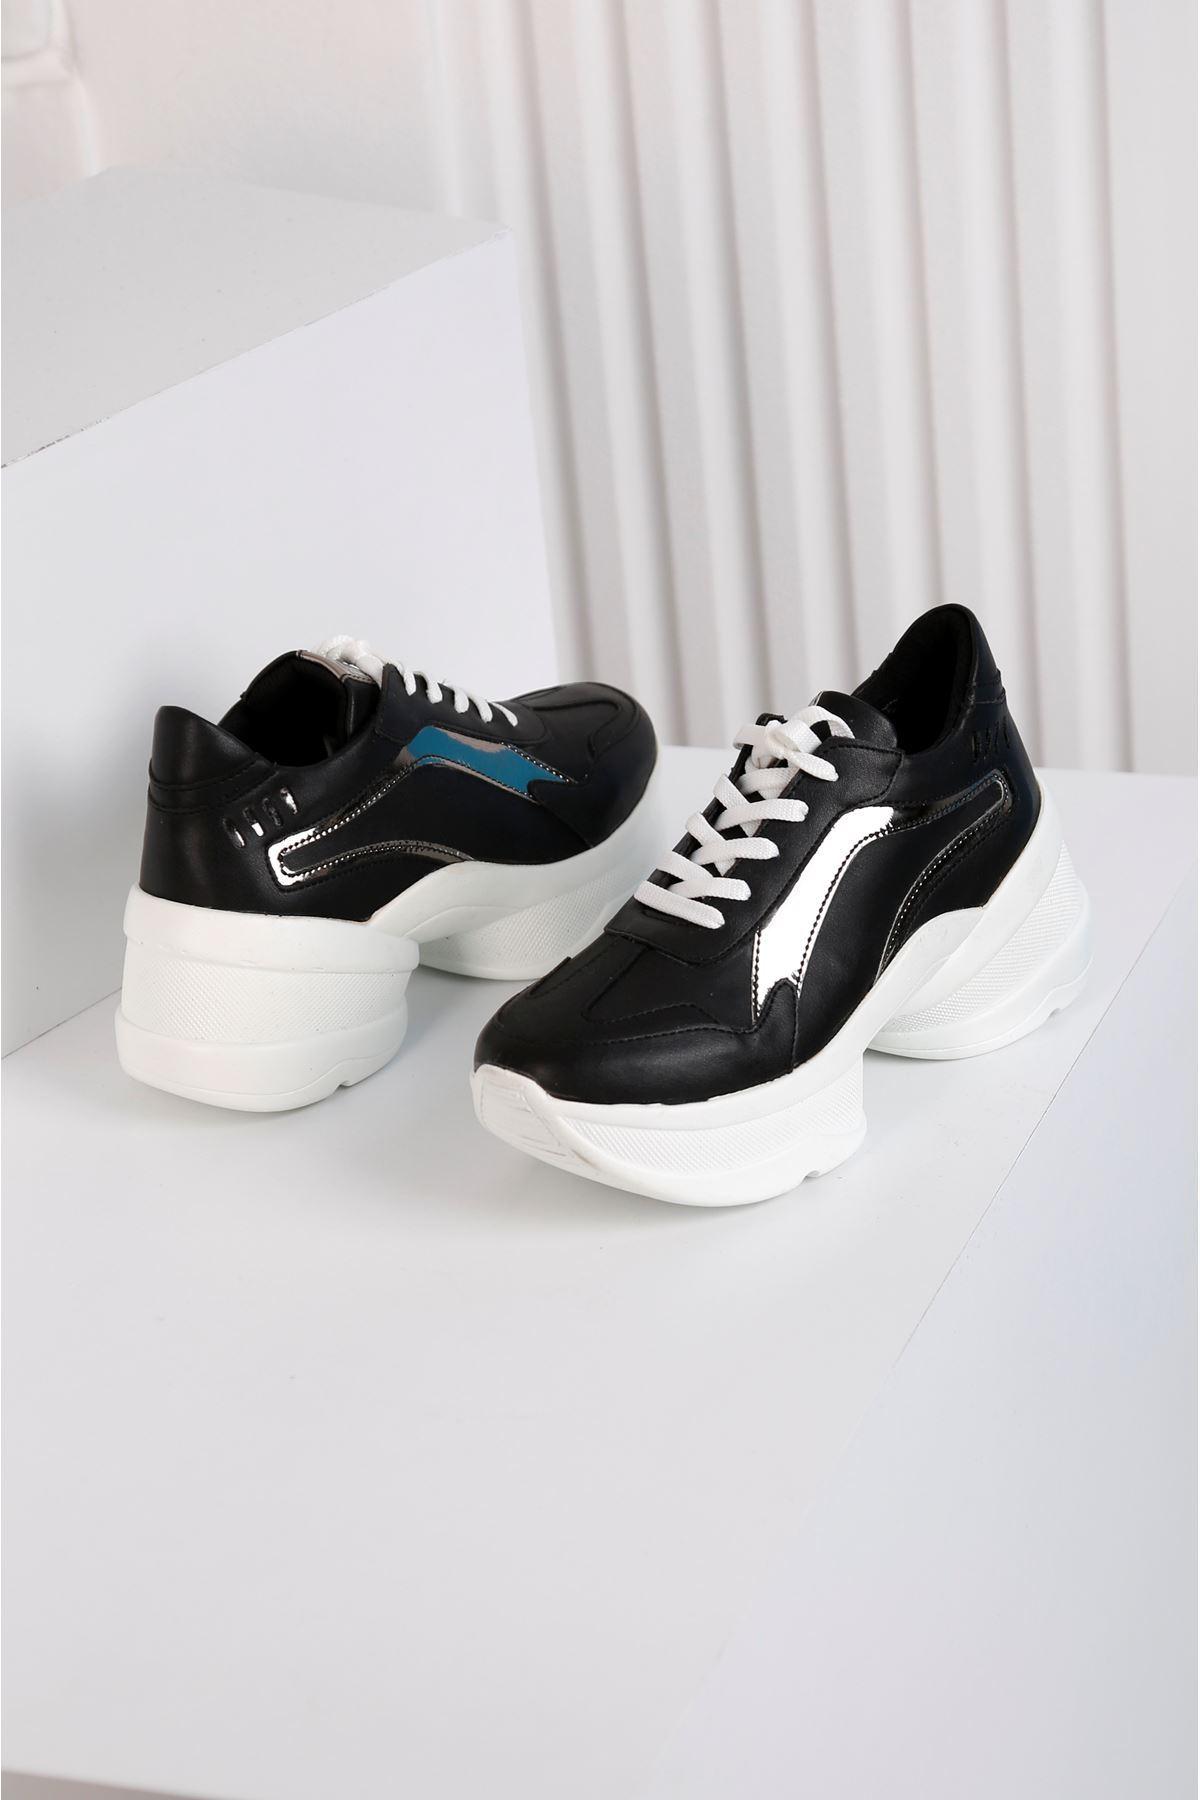 Spring  Siyah Spor Ayakkabı